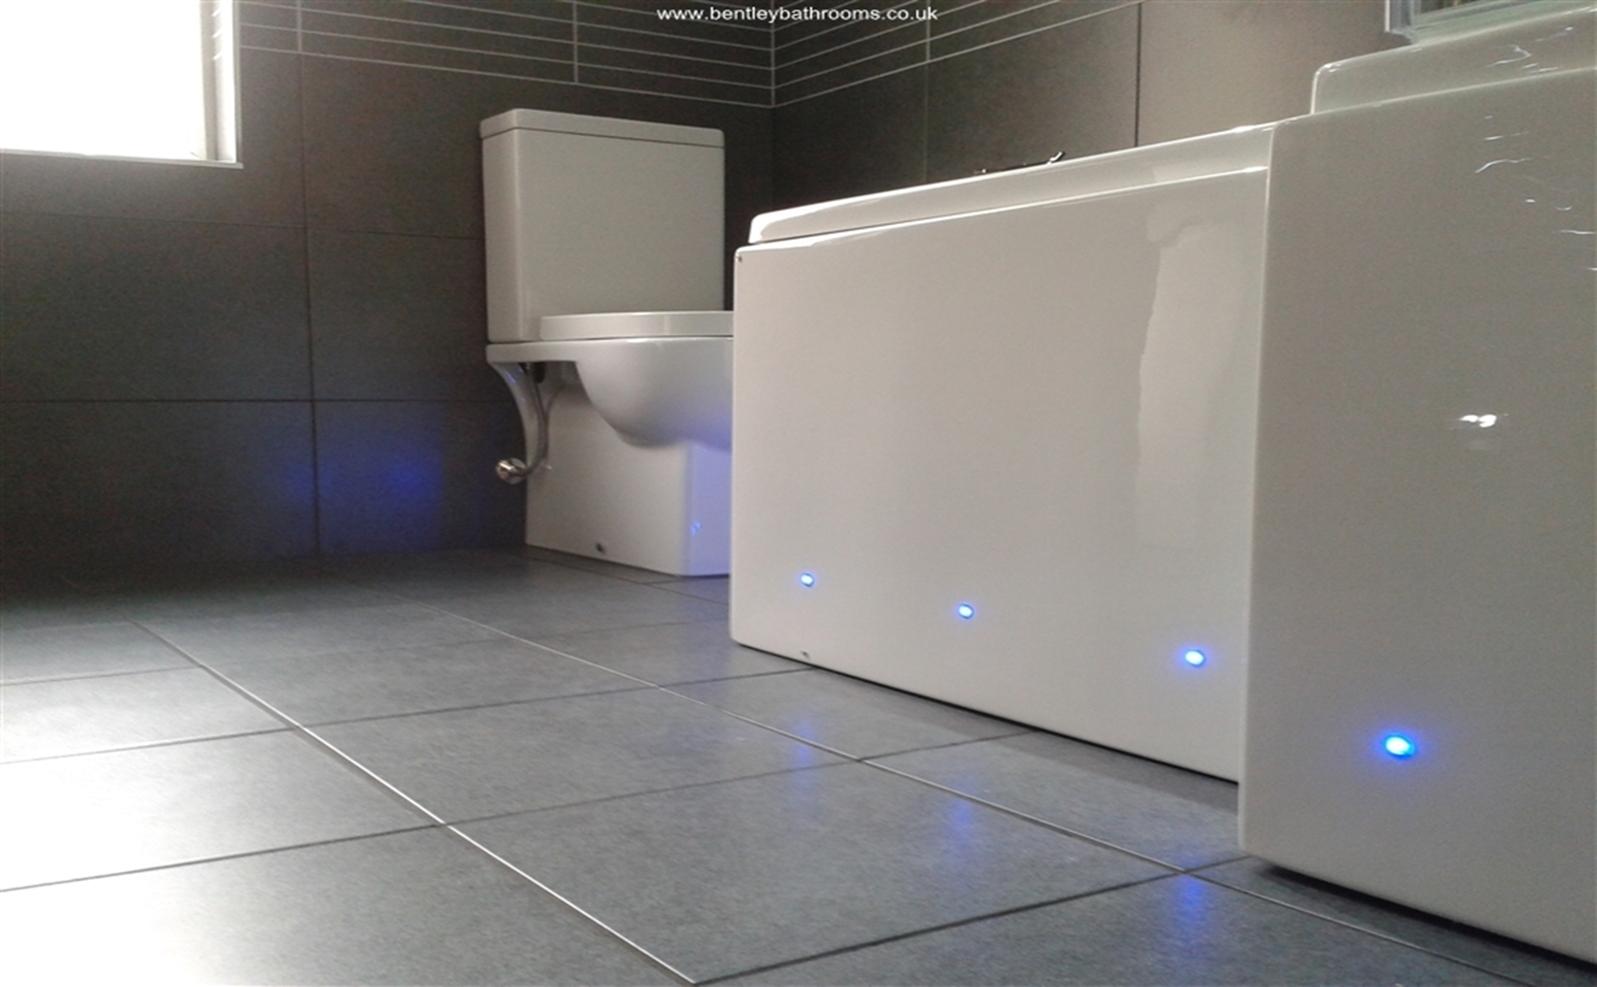 Edenvale Bathroom Renovation